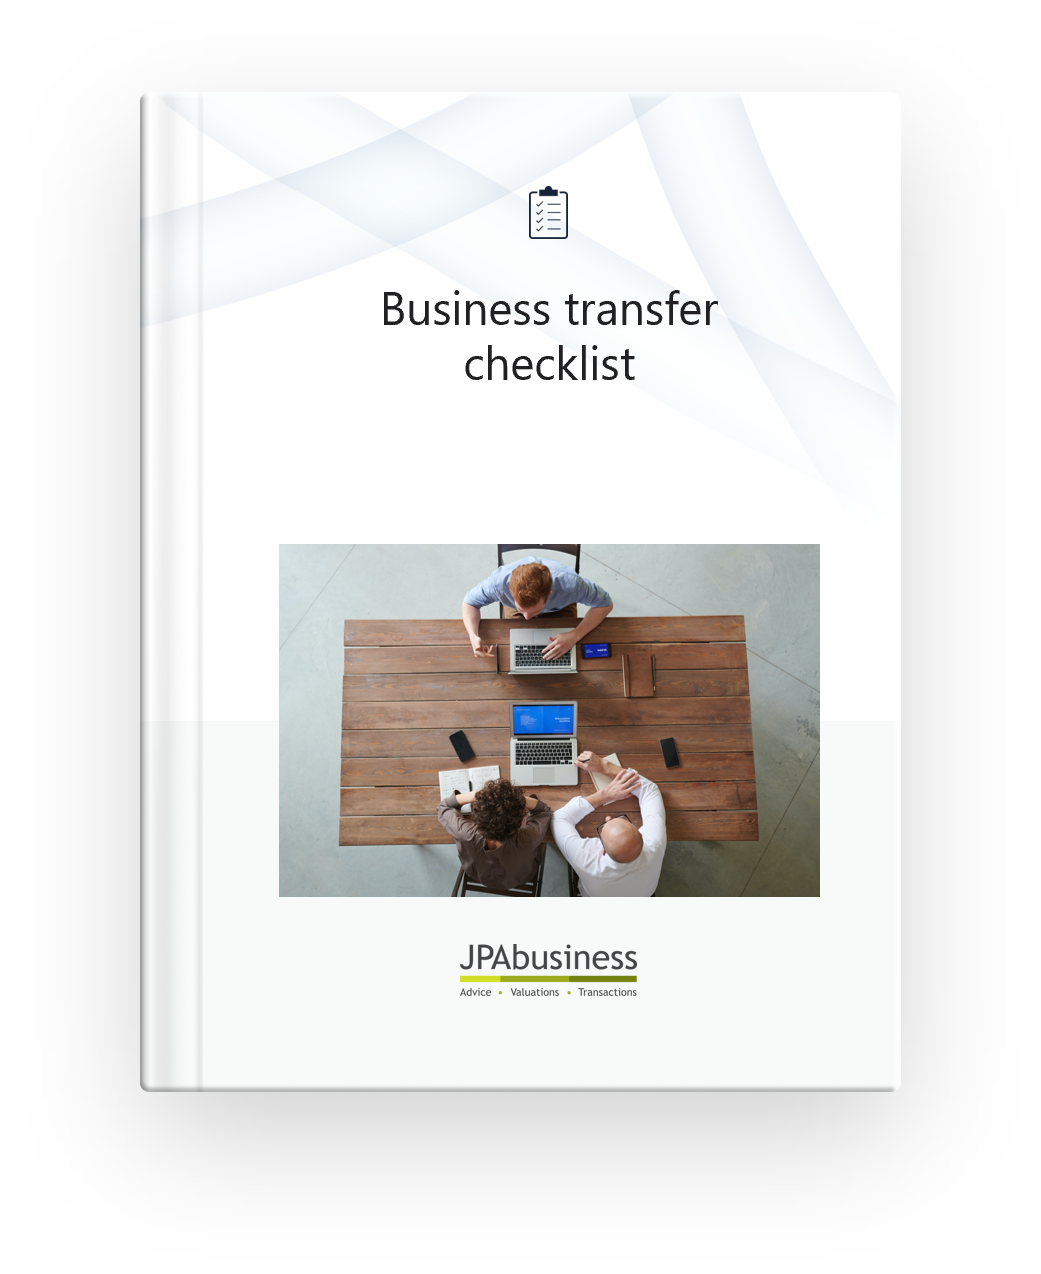 The_Business_Transfer_Checklist_JPAbusiness